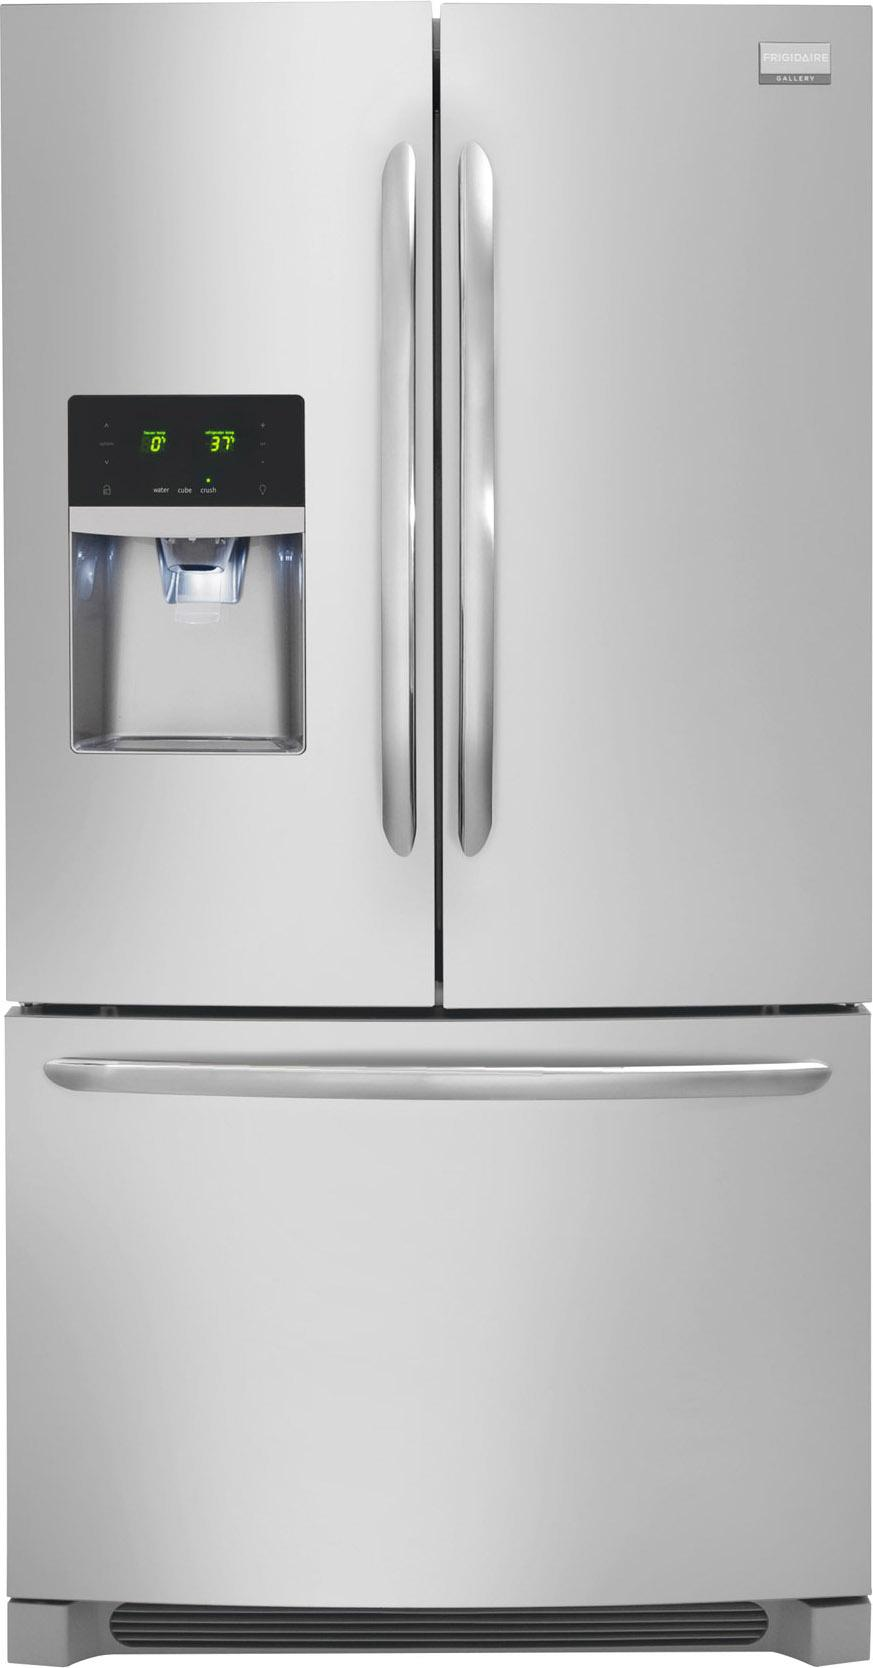 Frigidaire Frigidaire Gallery Refrigerators 27.8 Cu. Ft. French Door Refrigerator - Item Number: FGHB2866PF